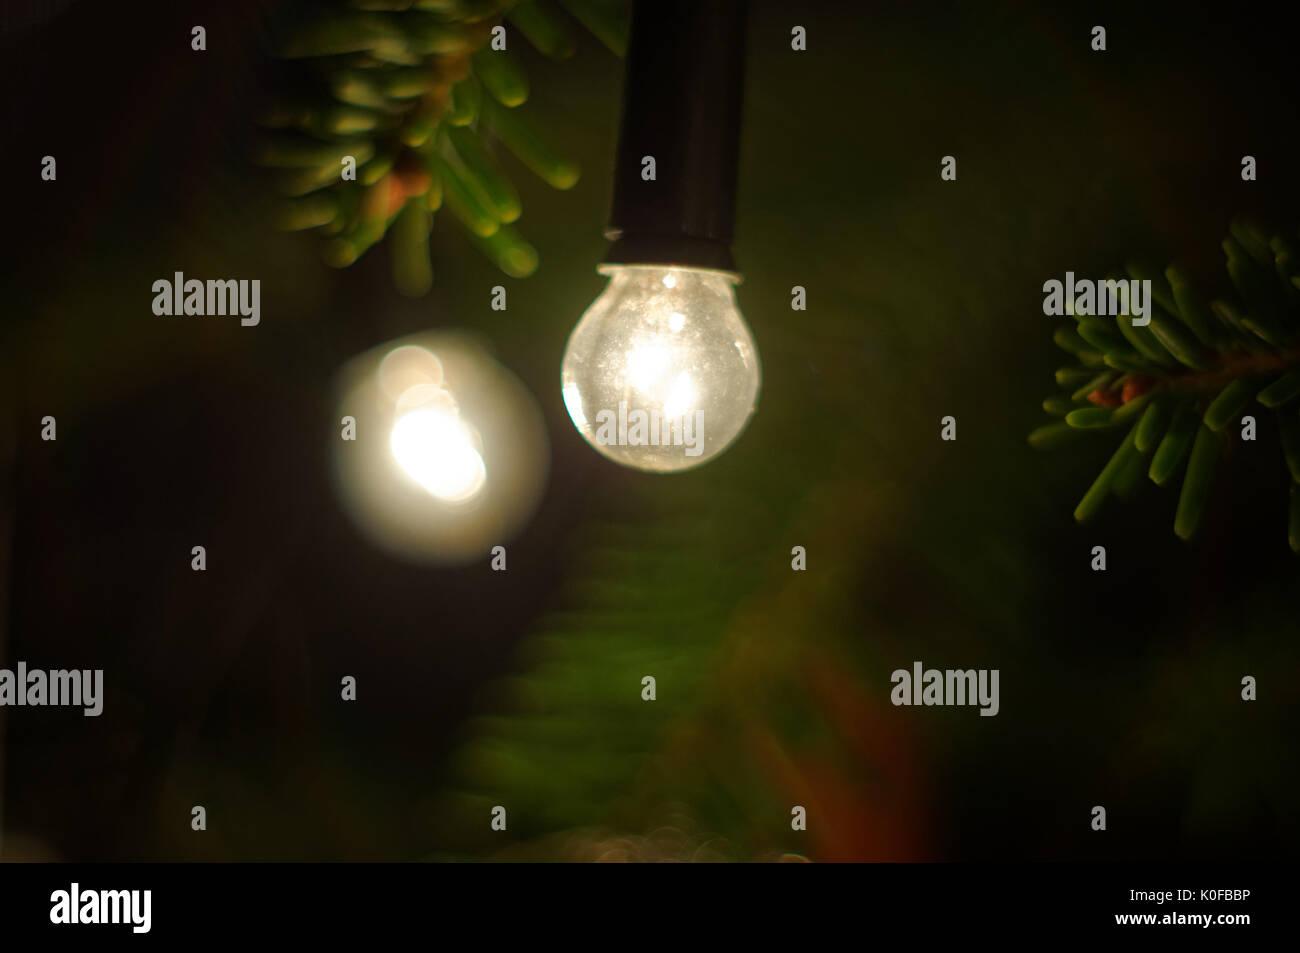 Christmas lamp hanging on a twig of a Christmas tree. - Stock Image